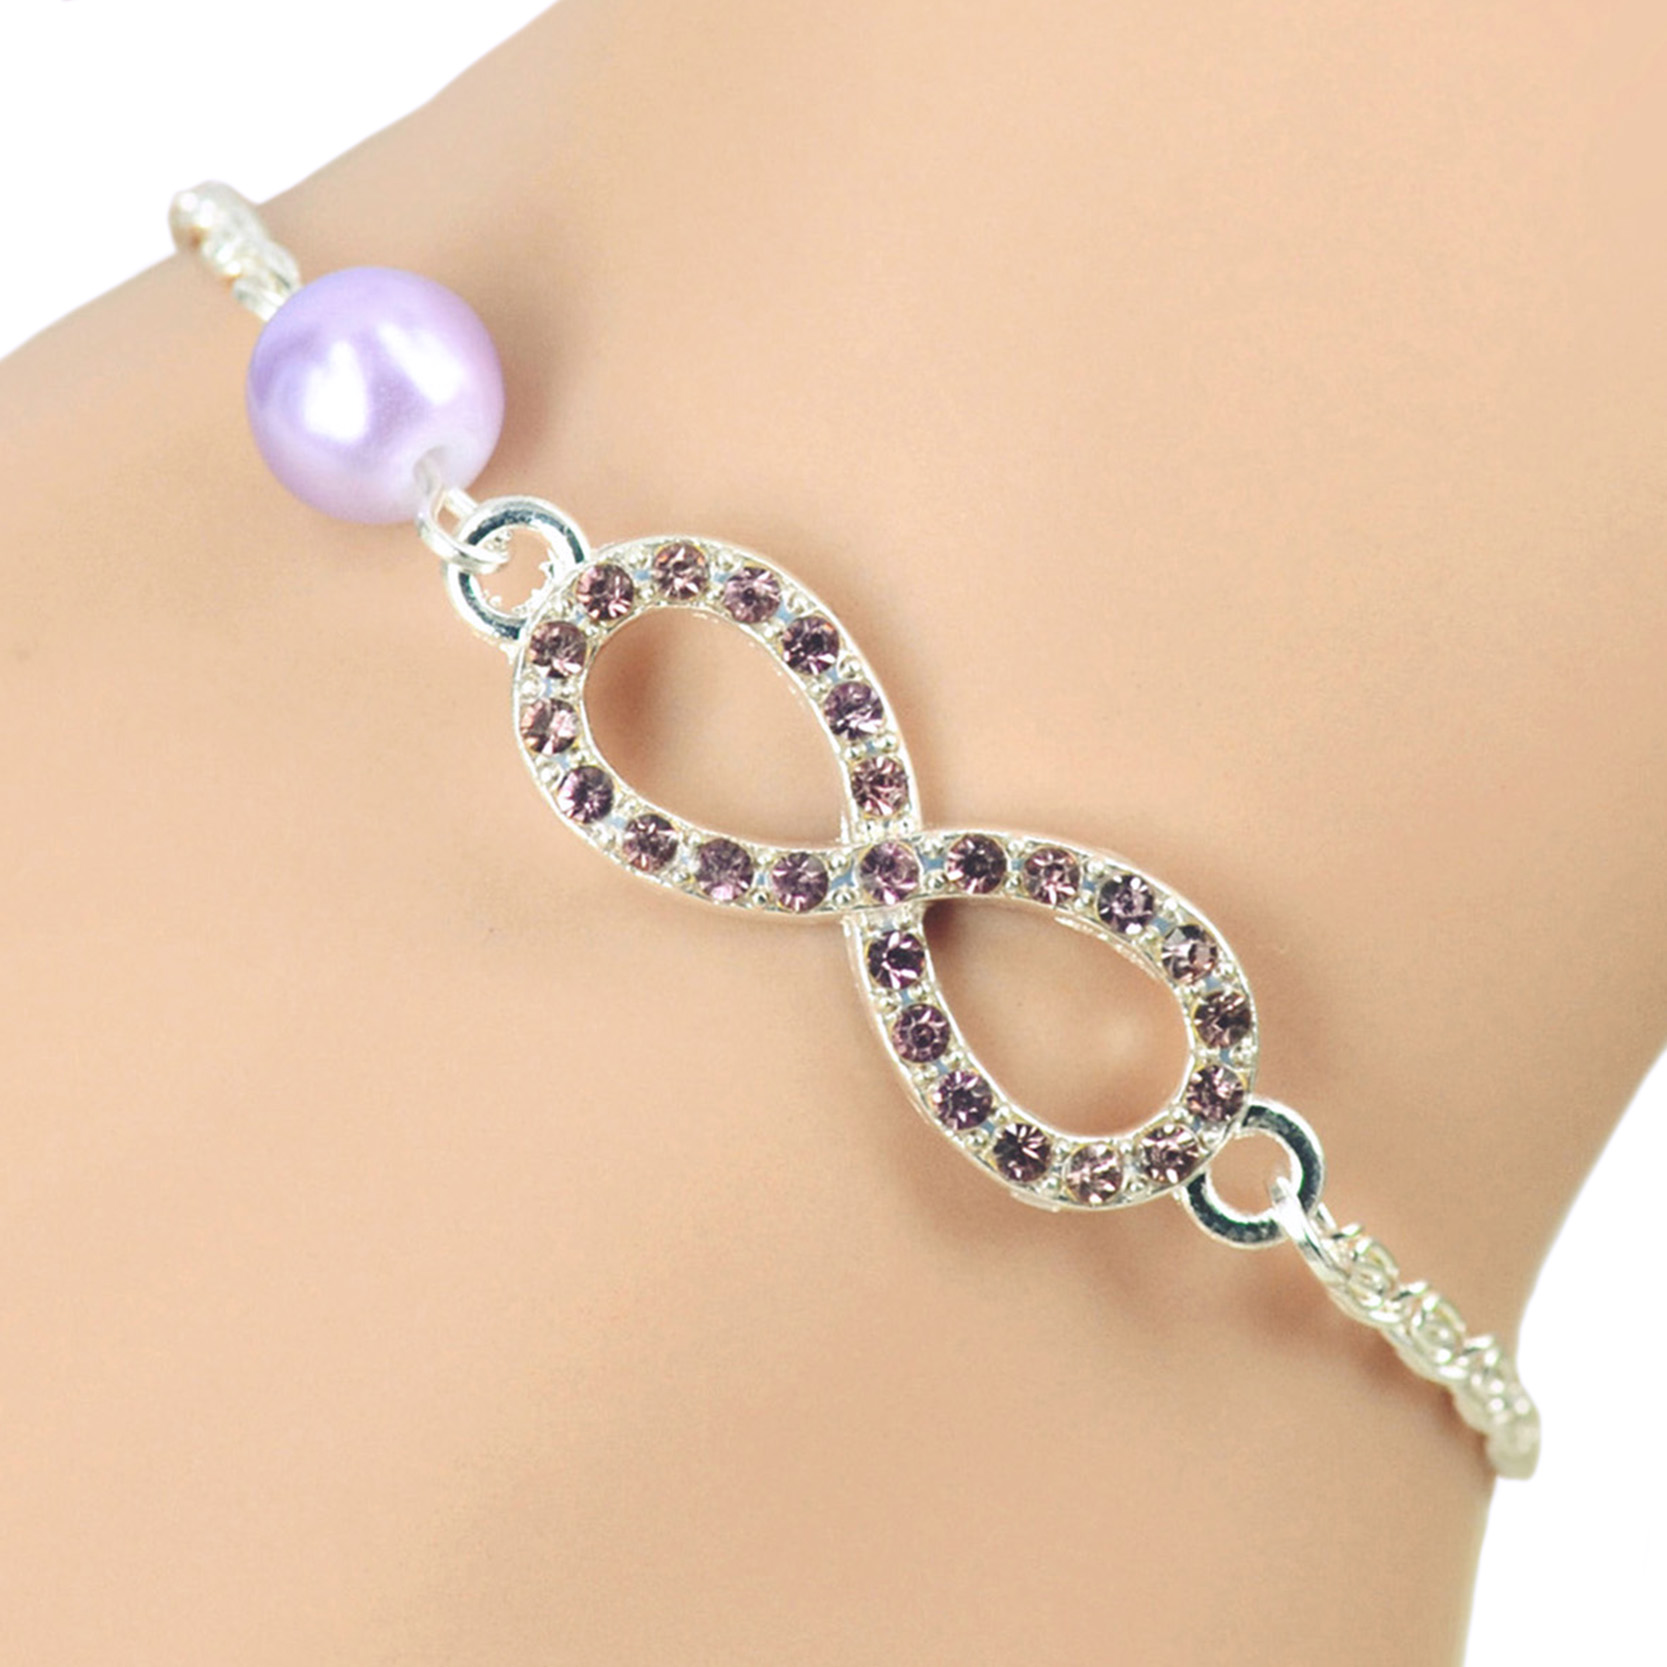 018ba34b2 2017 Fashion Women Bracelets Love Jewelry Silver Plated Chain Imitation  Pearl Charm Bracelets For Women Rhinestone Bracelets